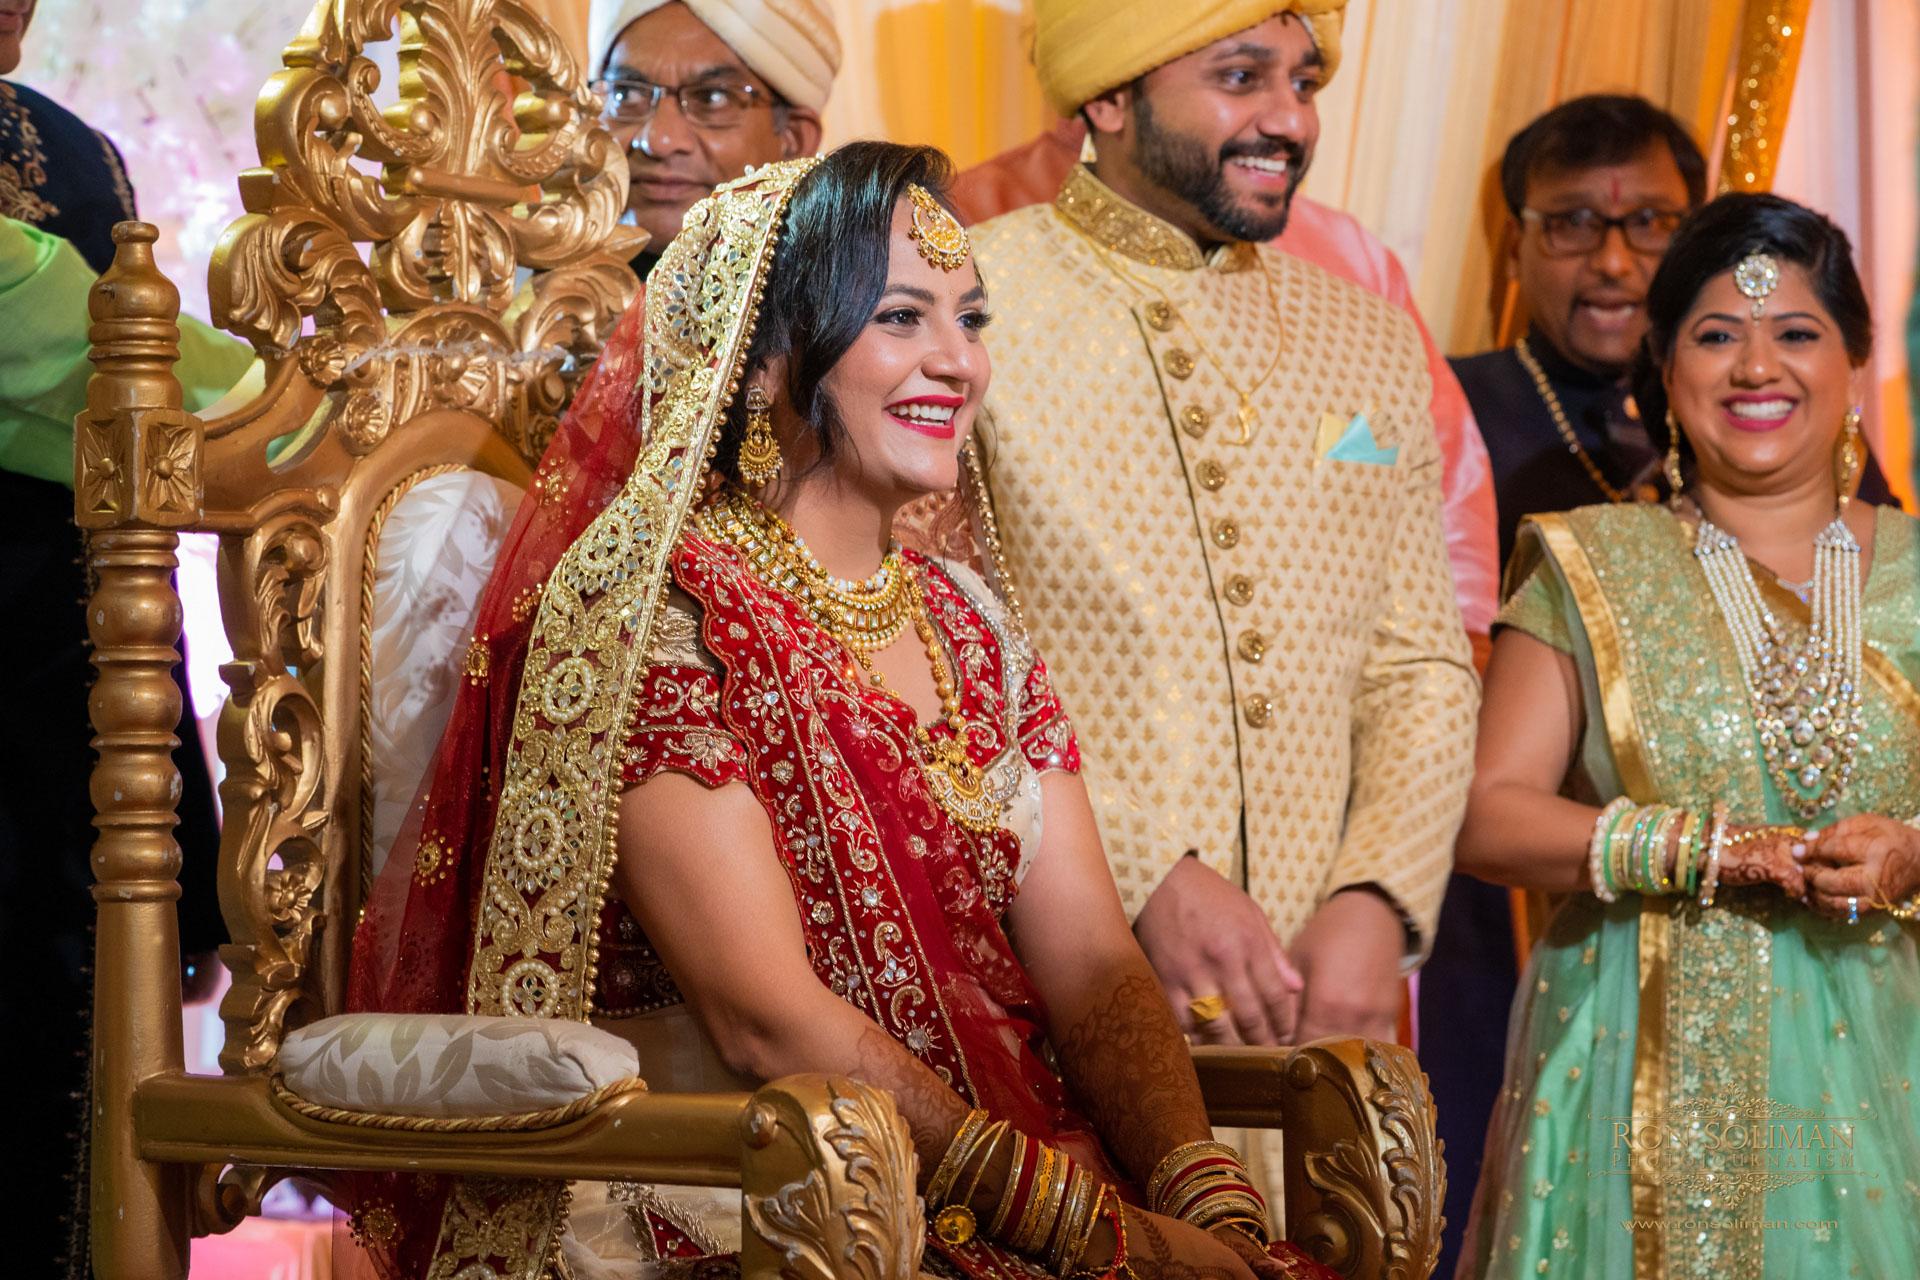 HILTON PARSIPANNY INDIAN WEDDING 23